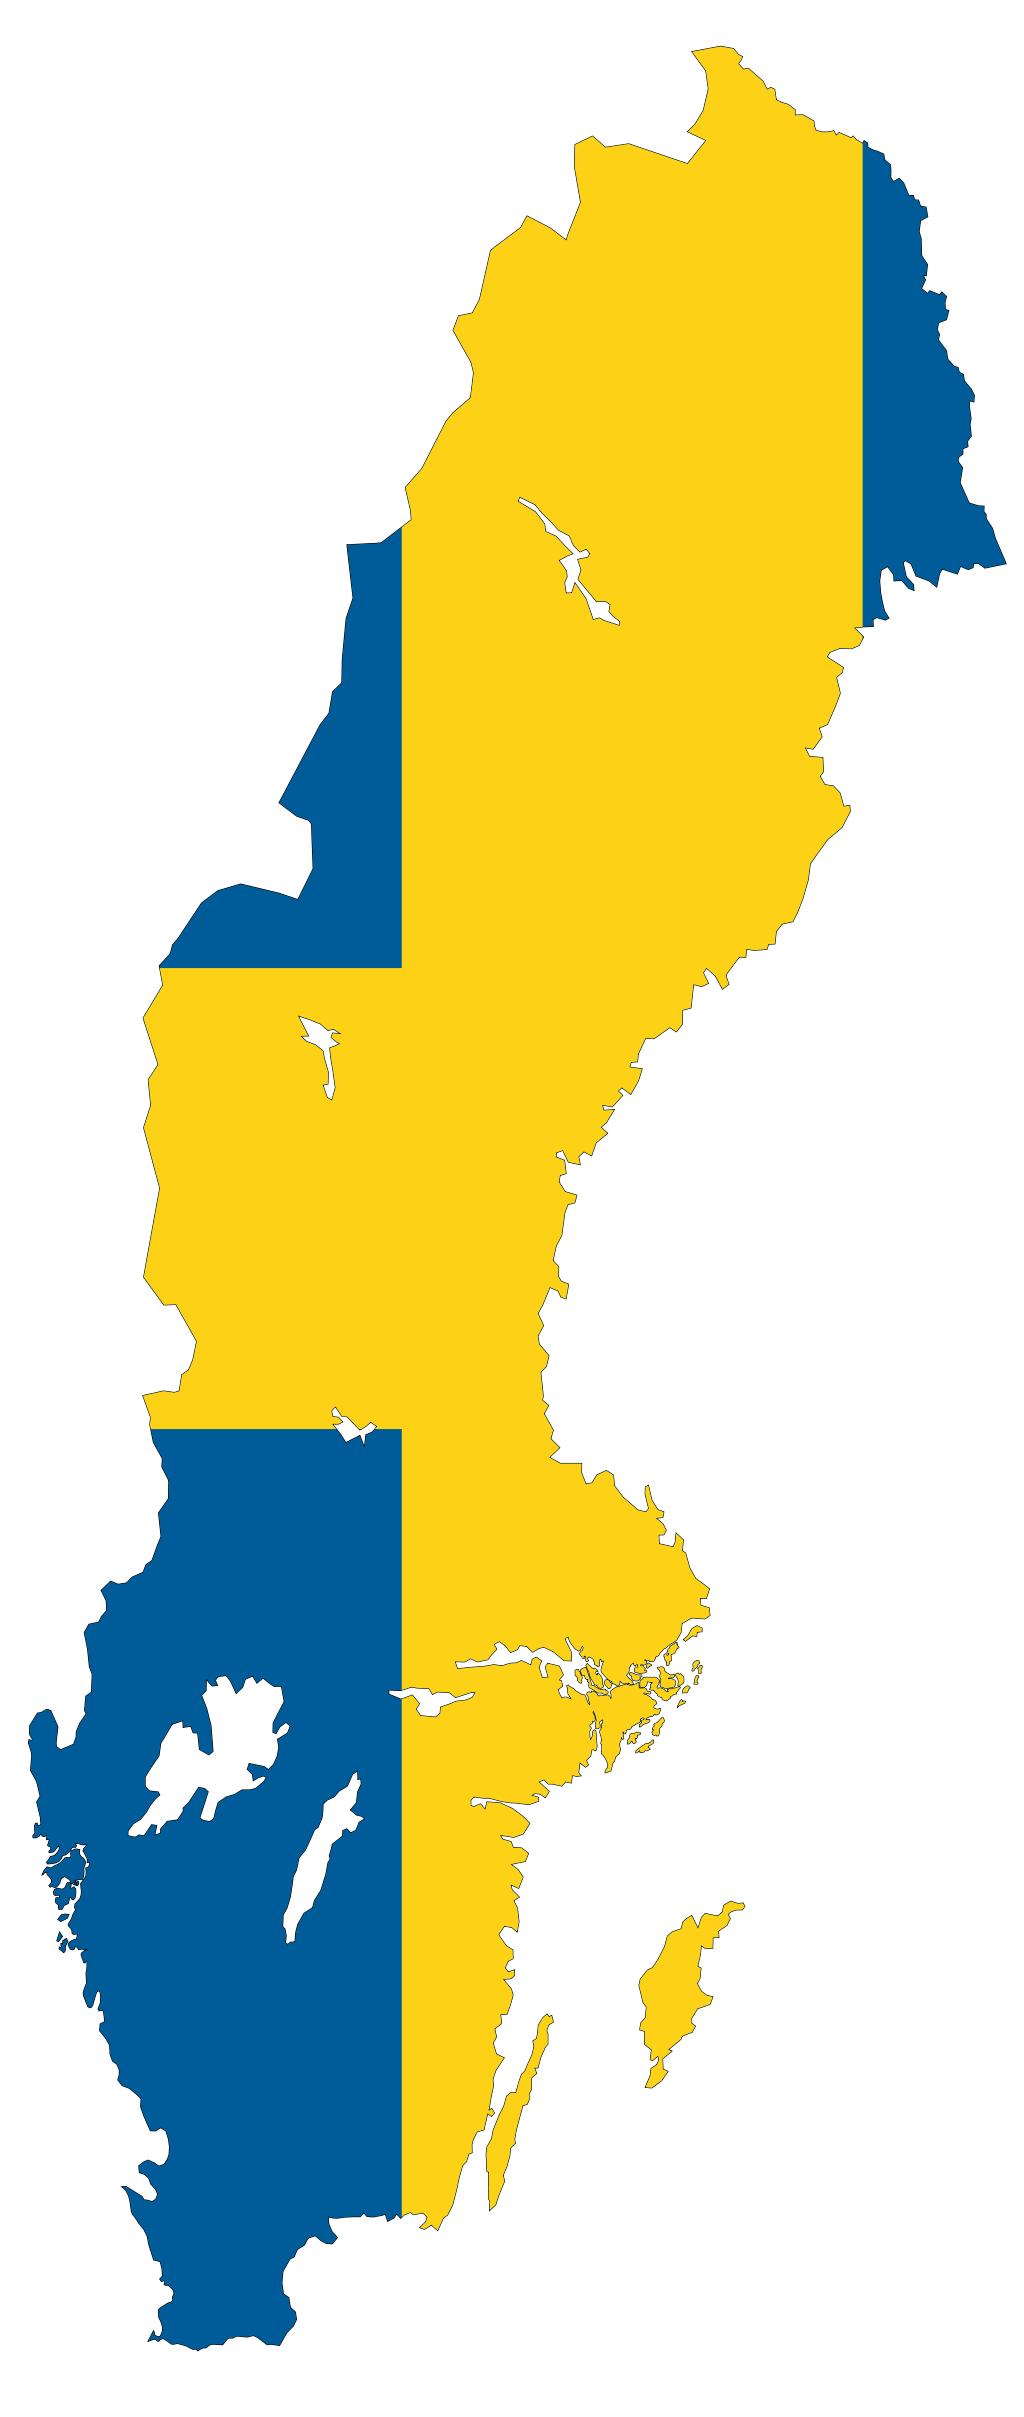 Pinata clipart flag. Sweden map maps pinterest